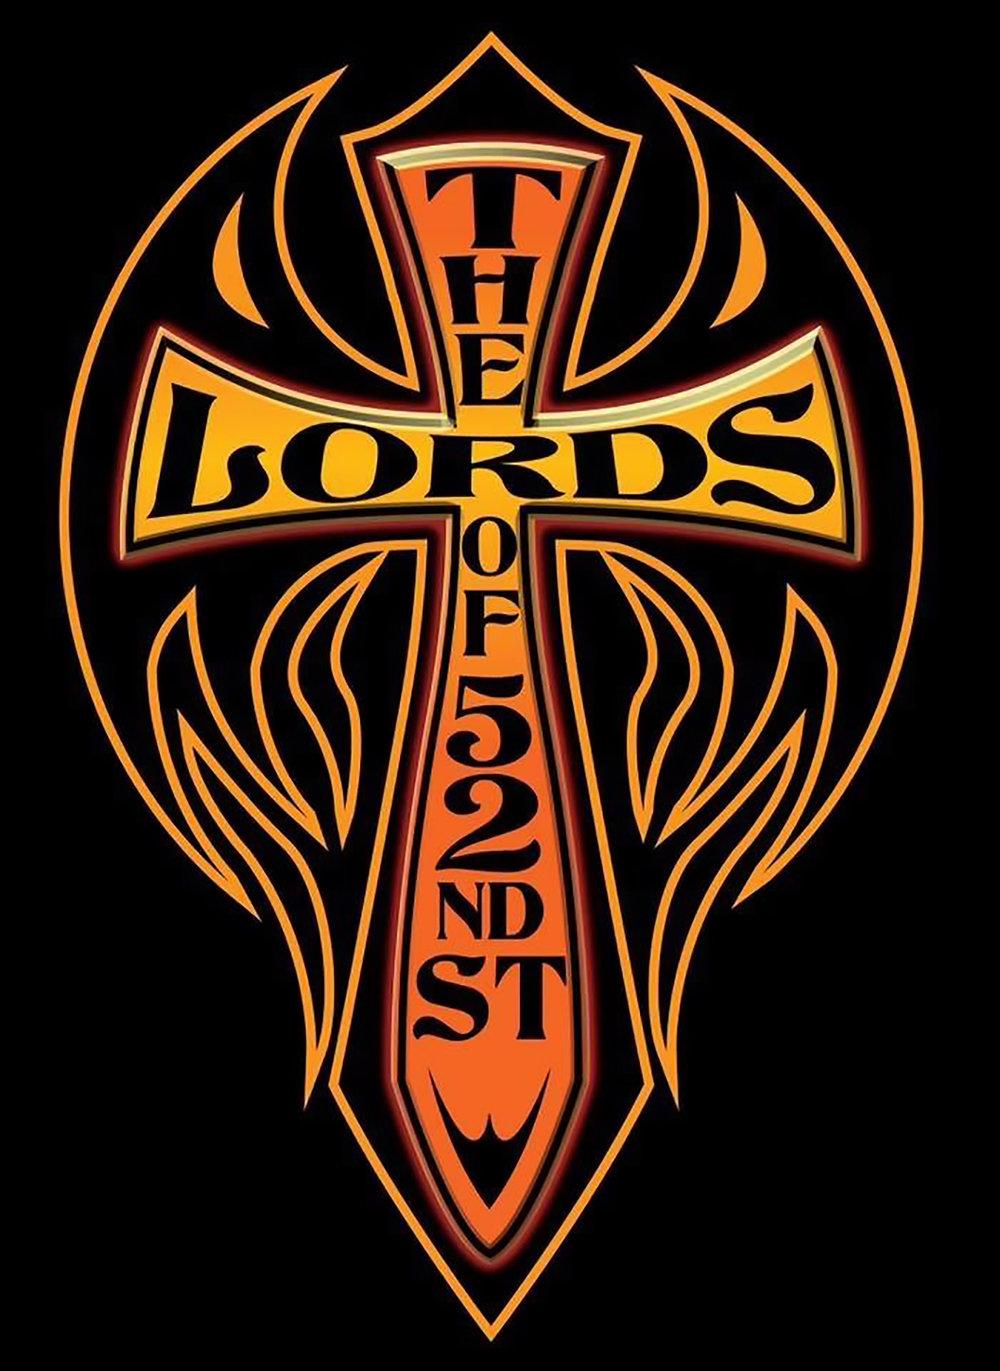 Lordsof52ndStWeb3.jpg